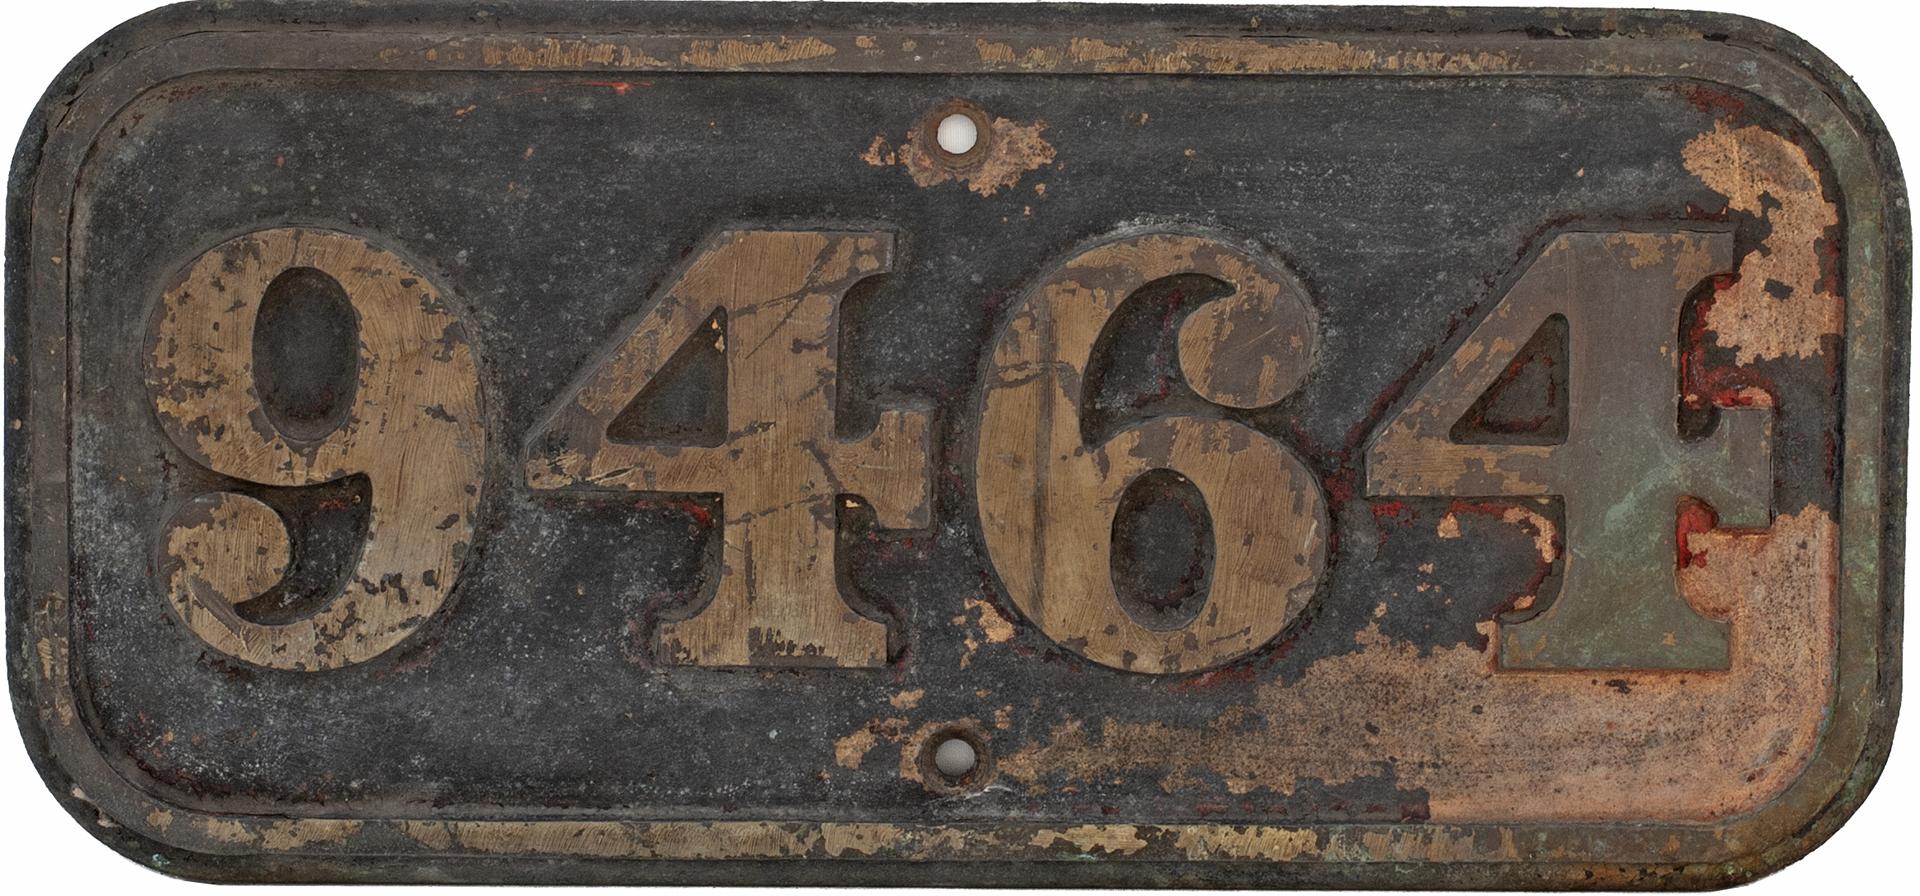 BR(W) brass cabside numberplate 9464 ex Hawksworth 0-6-0 PT built by Robert Stephenson & Hawthorn